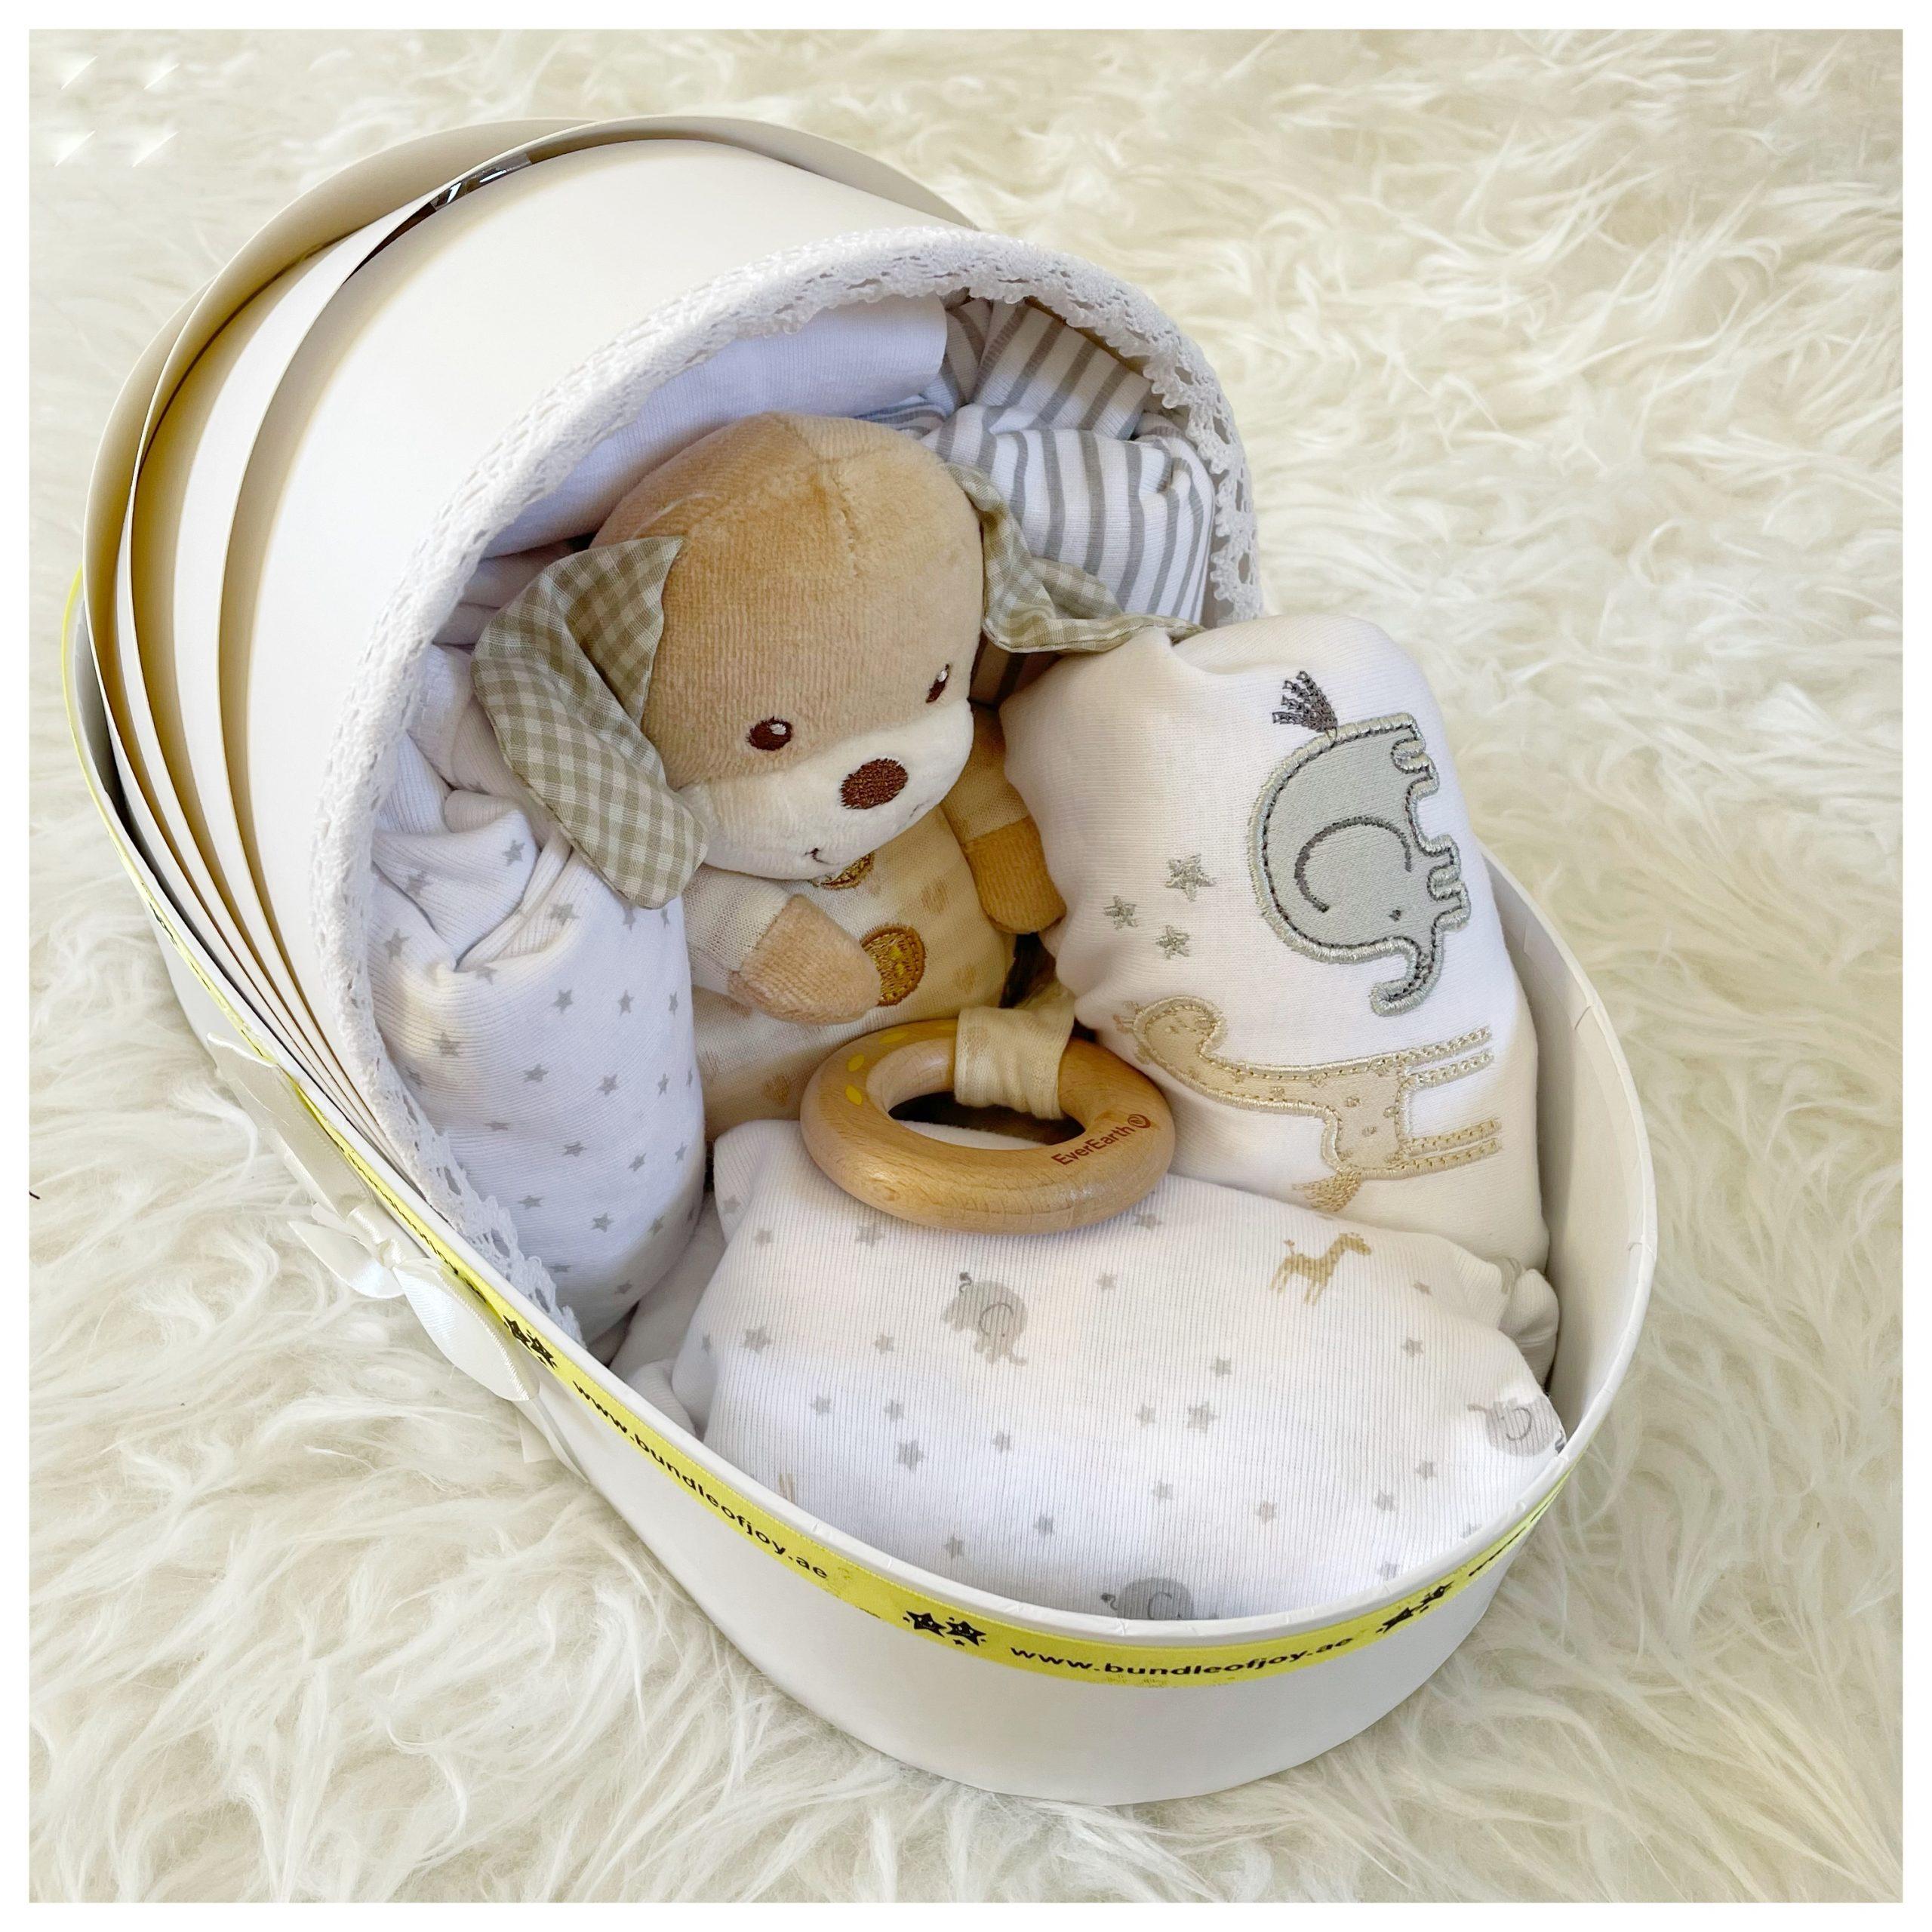 cuddle basket